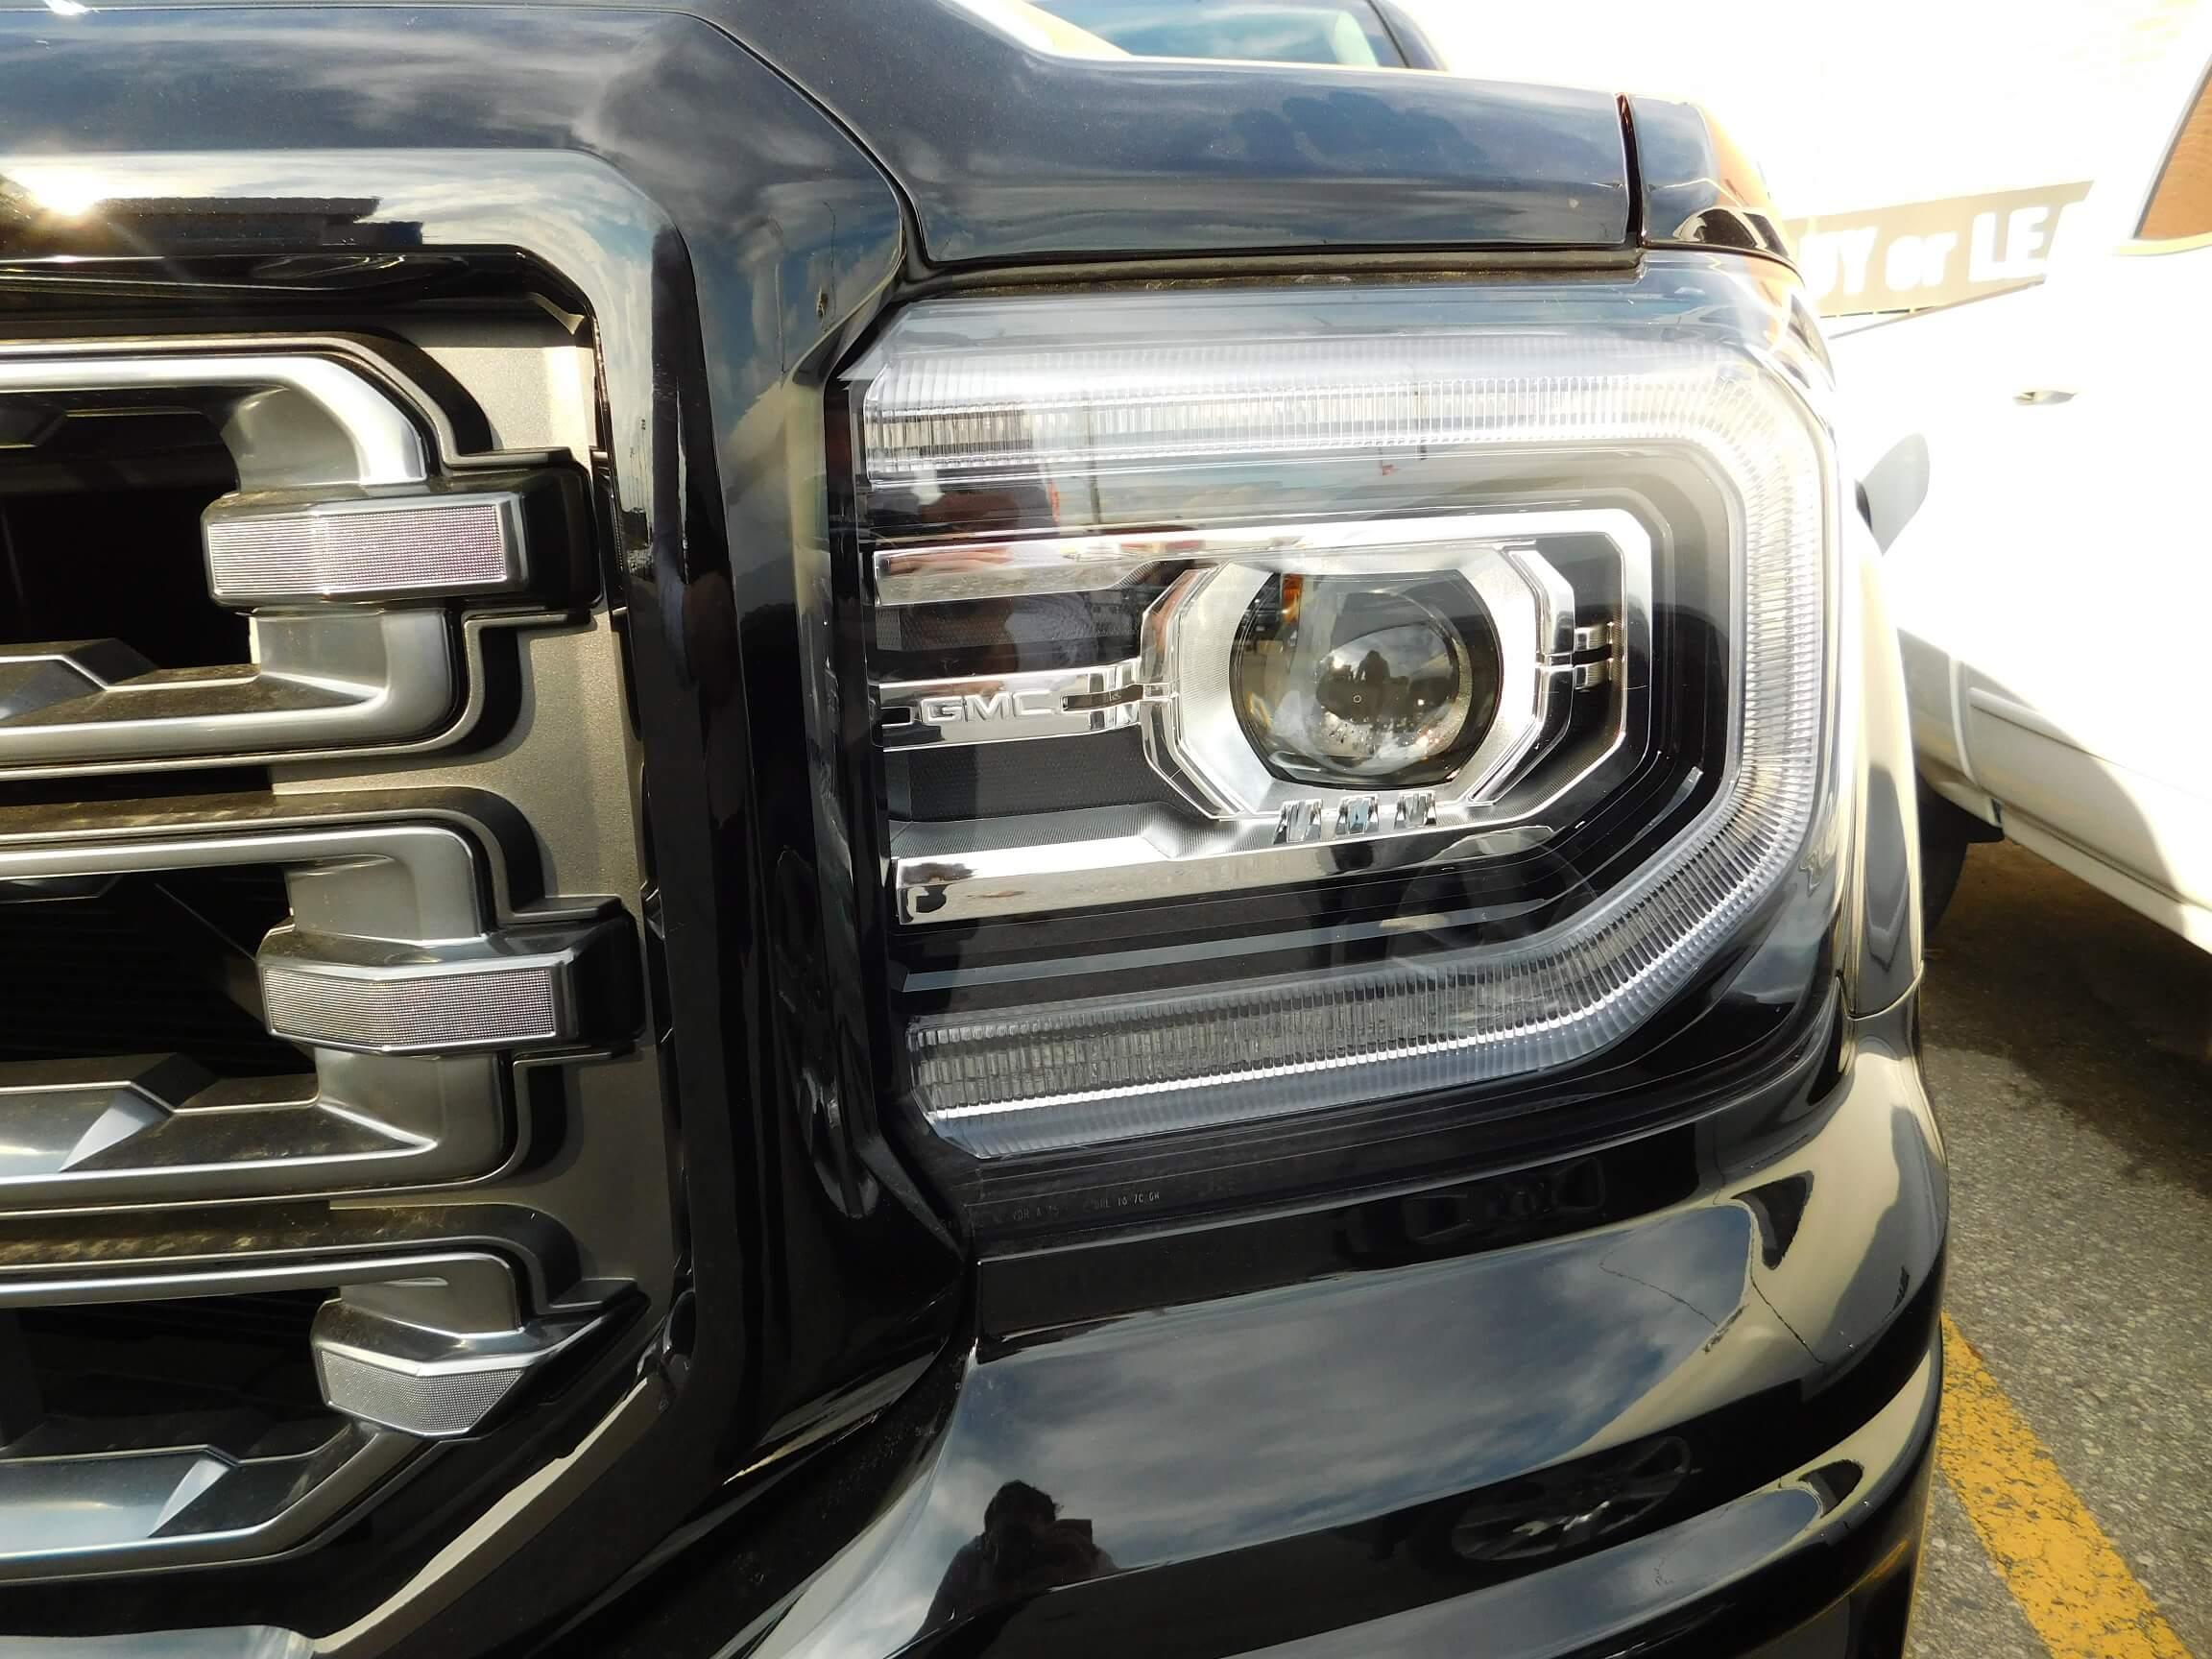 2016 GMC Sierra headlight